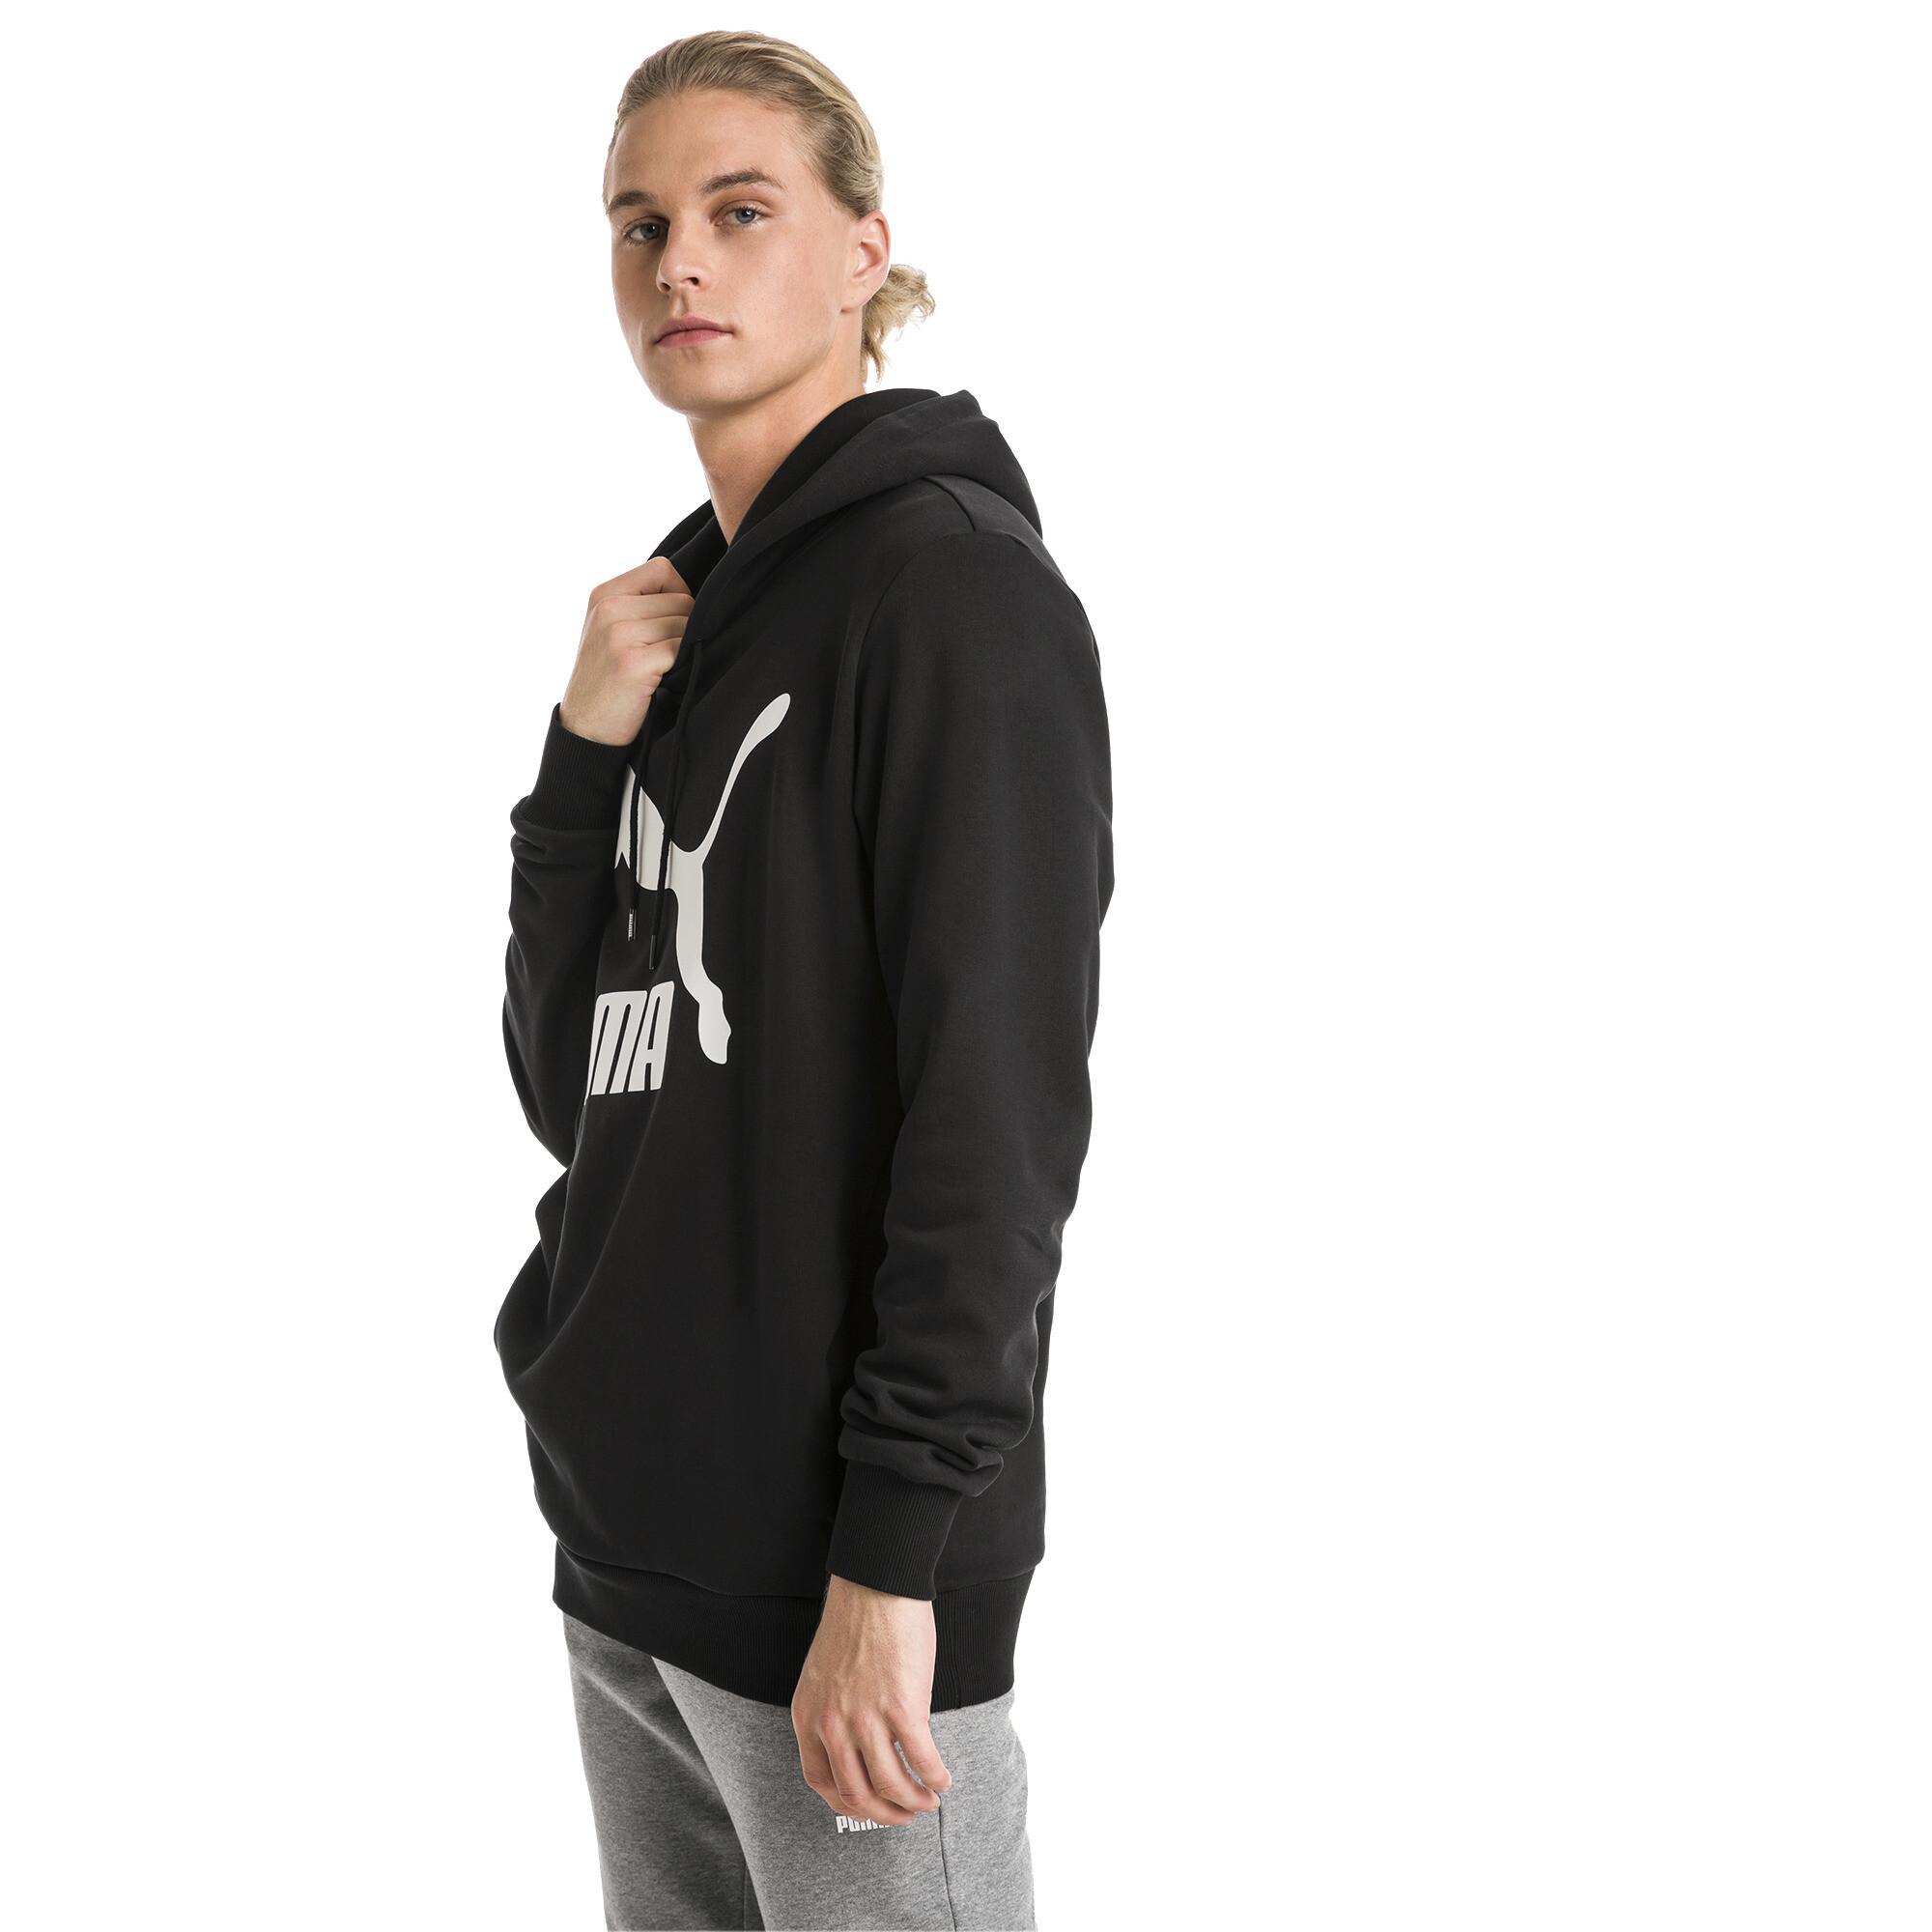 e4aa3b832 Hoodies & Sweats - Clothing - Mens